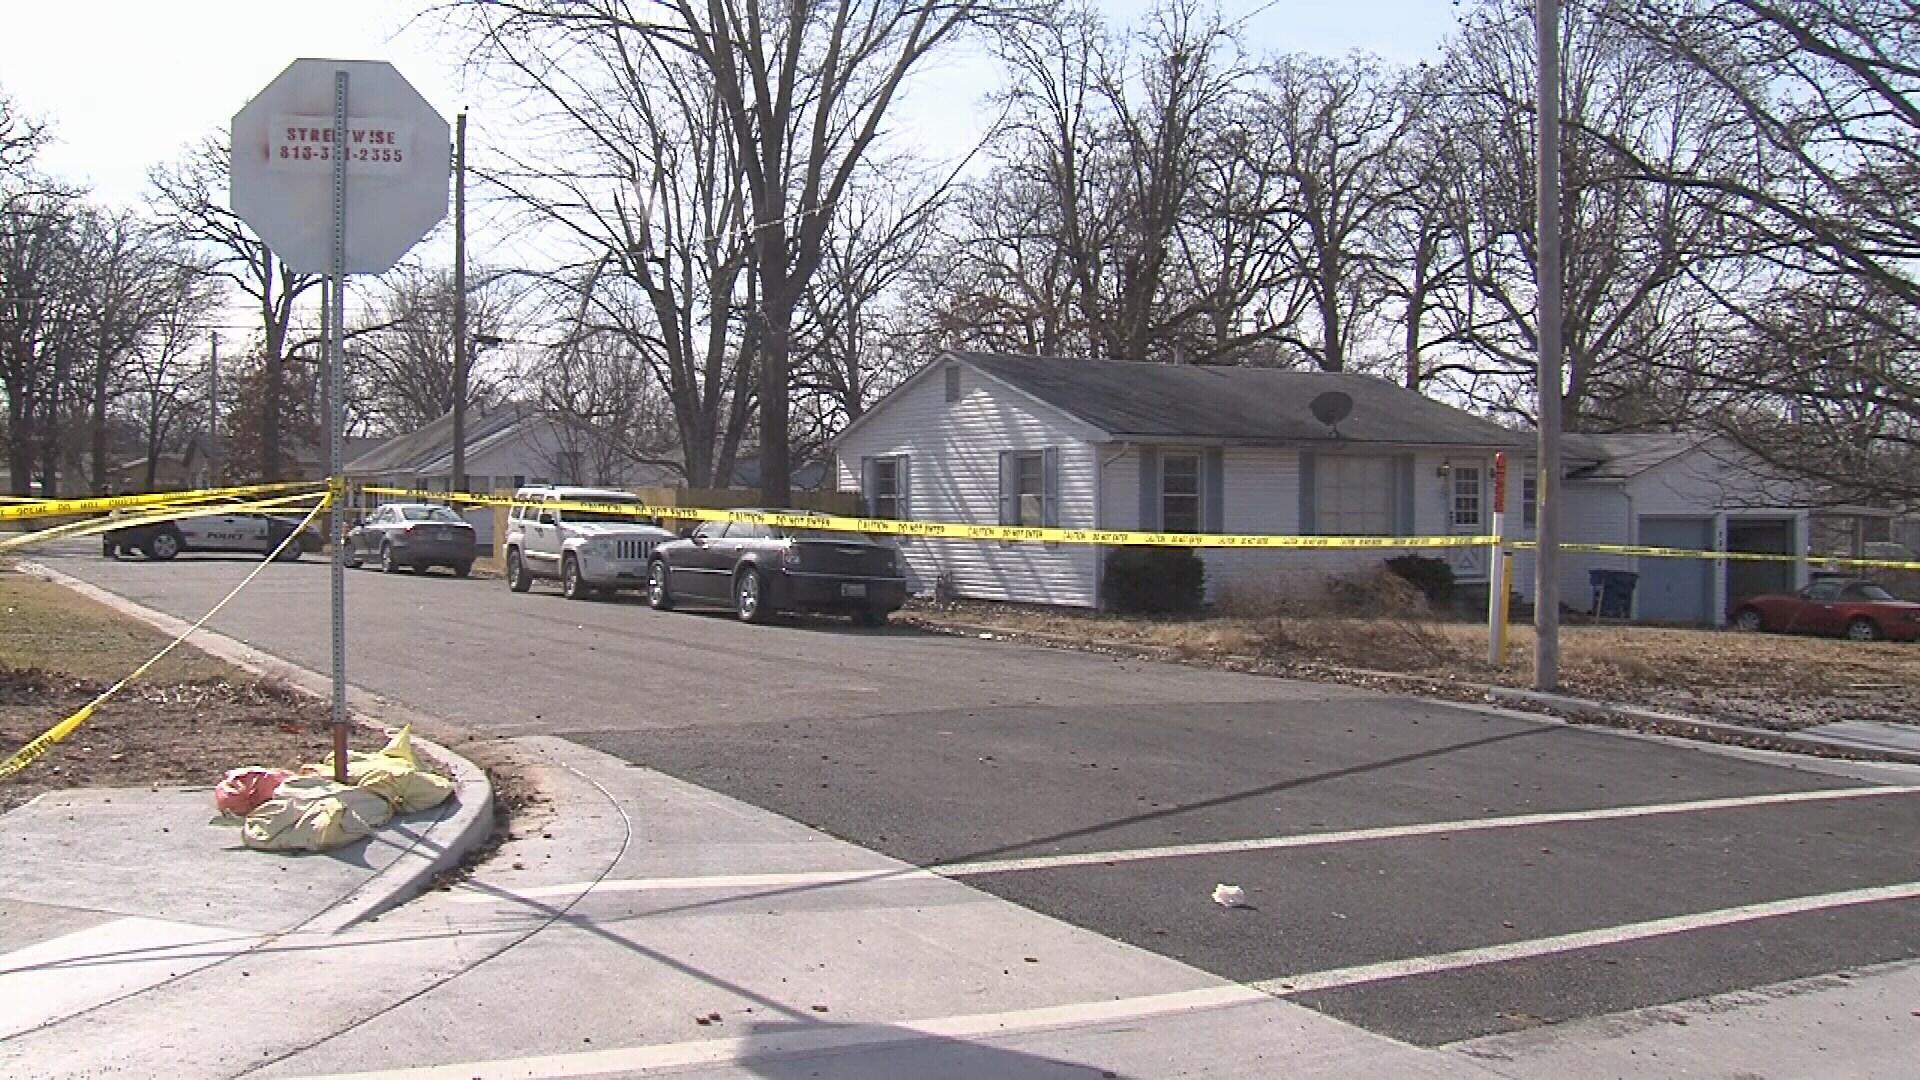 Taven Murder Case, Joplin, MO (2017)